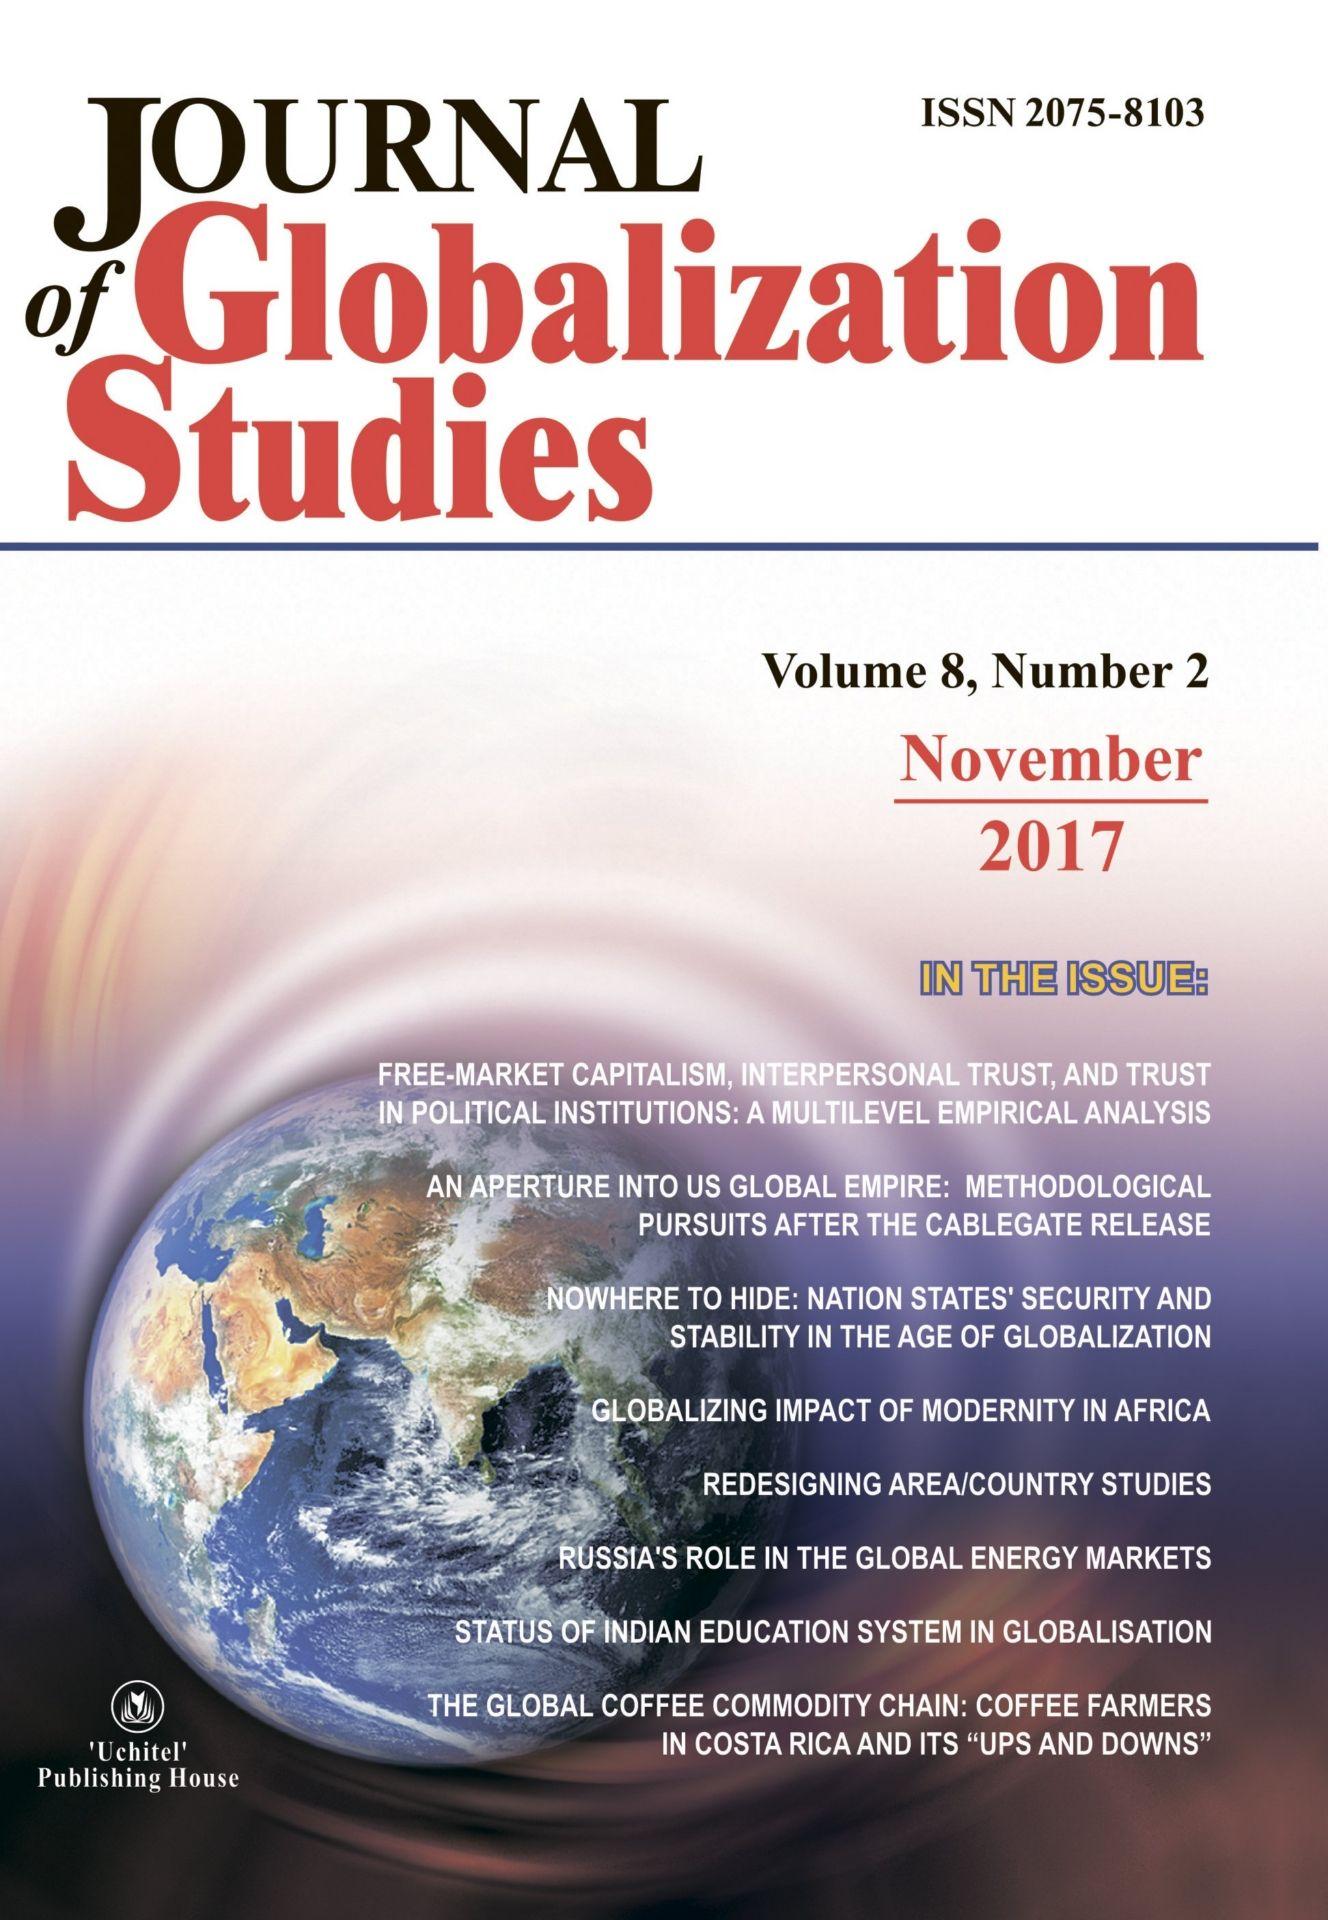 Journal of Globalization Studies Volume 8, Number 2, 2017 г. Журнал глобализационных исследований Международный журнал на английском языке